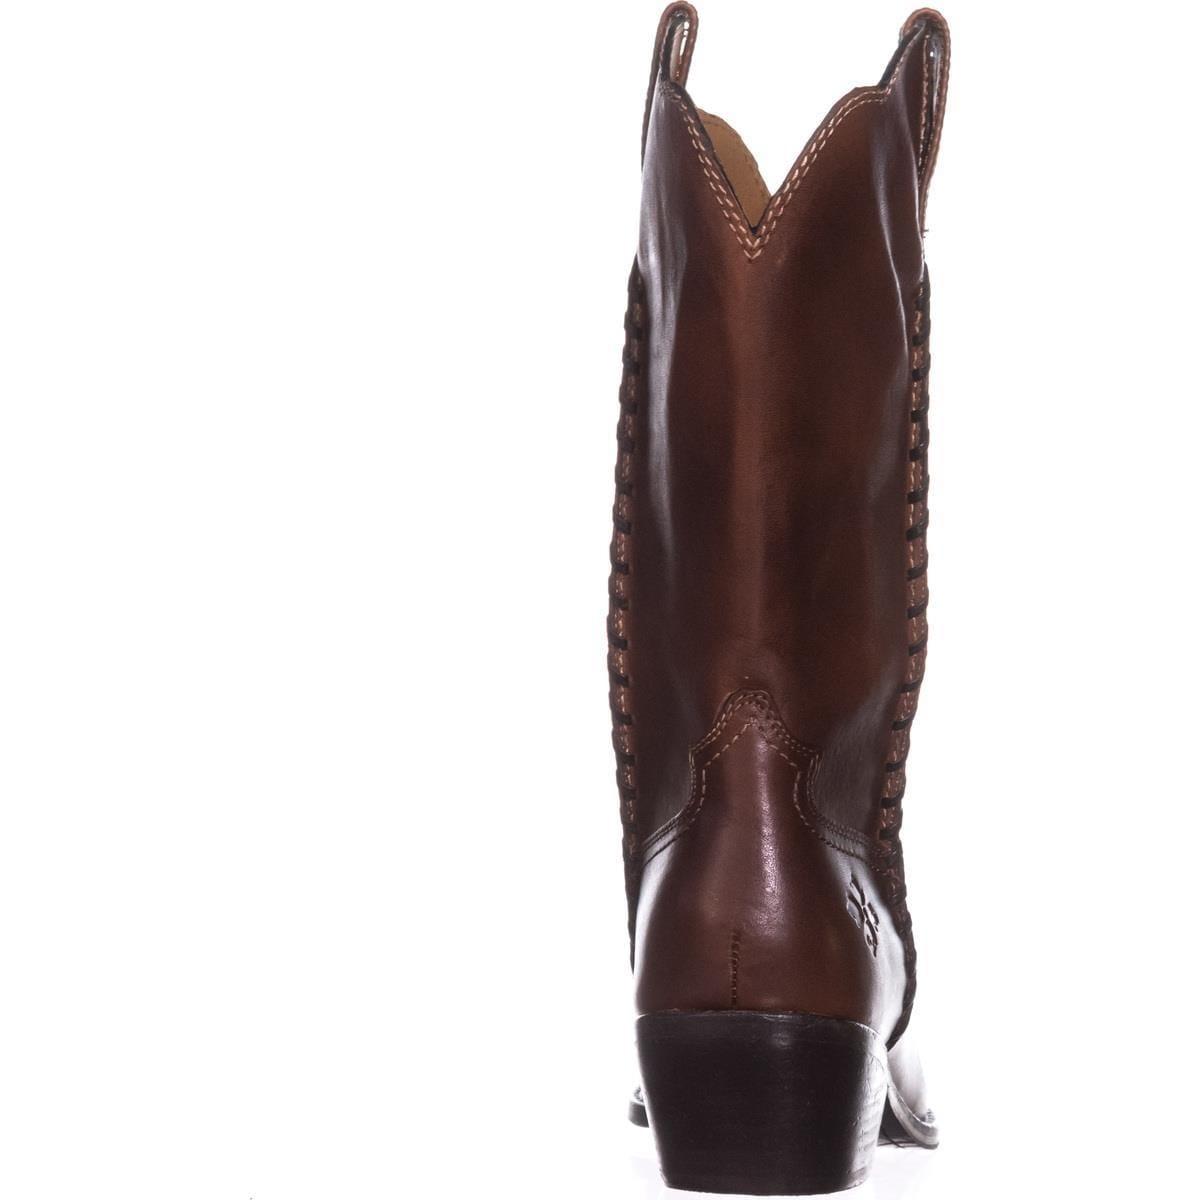 08b460b5912 Patricia Nash Bergamo Cowboy Boots, Whiskey